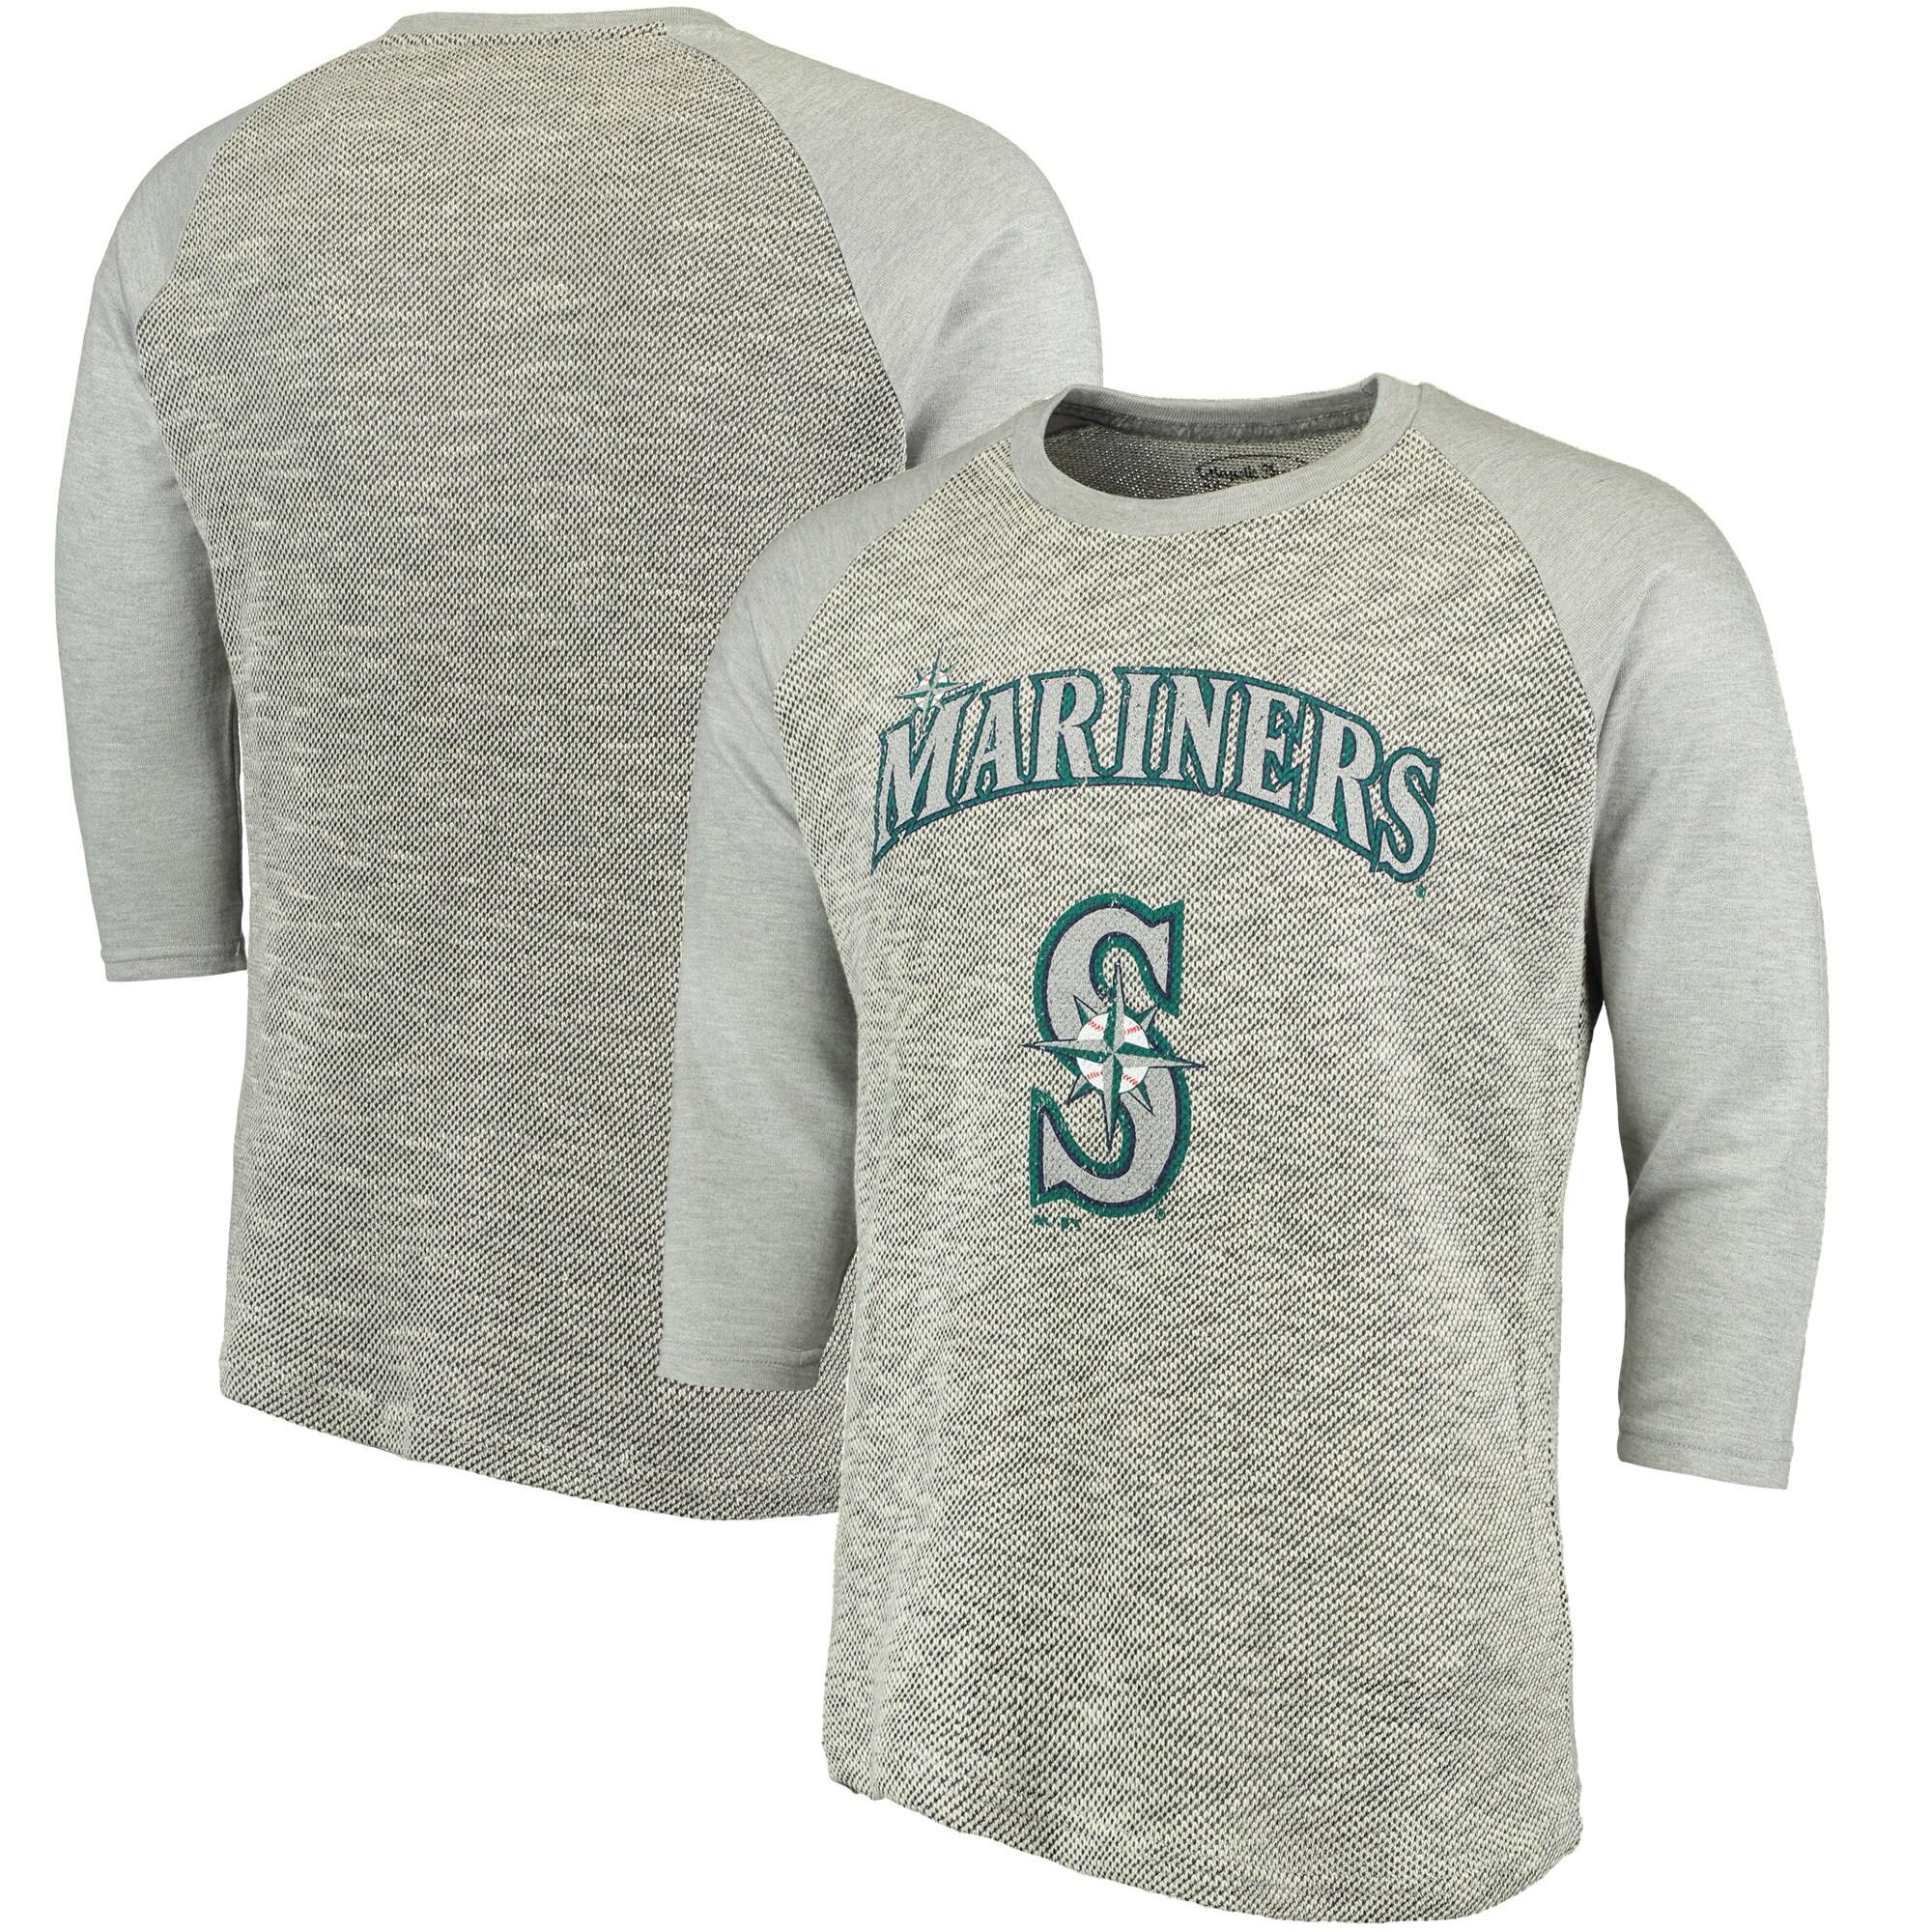 Seattle Mariners Majestic Threads Tri-Yarn French Terry 3/4-Sleeve Raglan T-Shirt - Gray